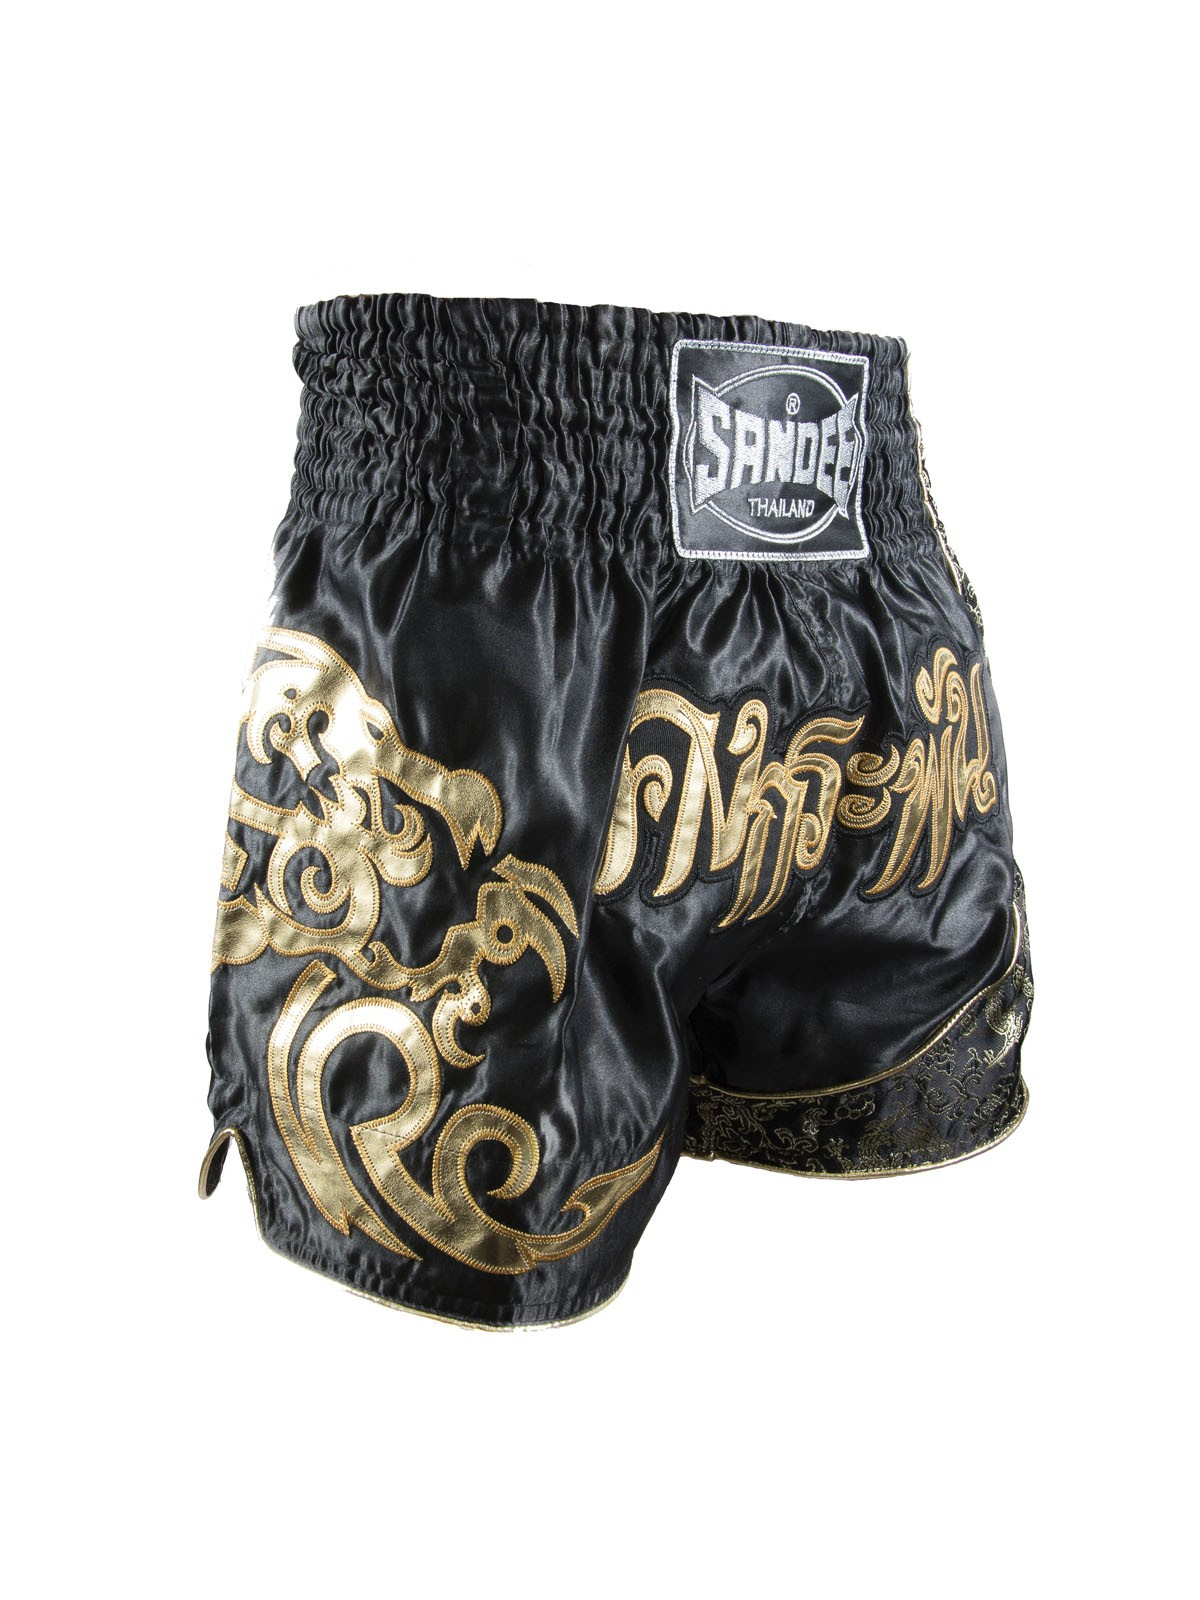 Sandee Unbreakable Black Gold Muay Thai Kick Boxing Shorts